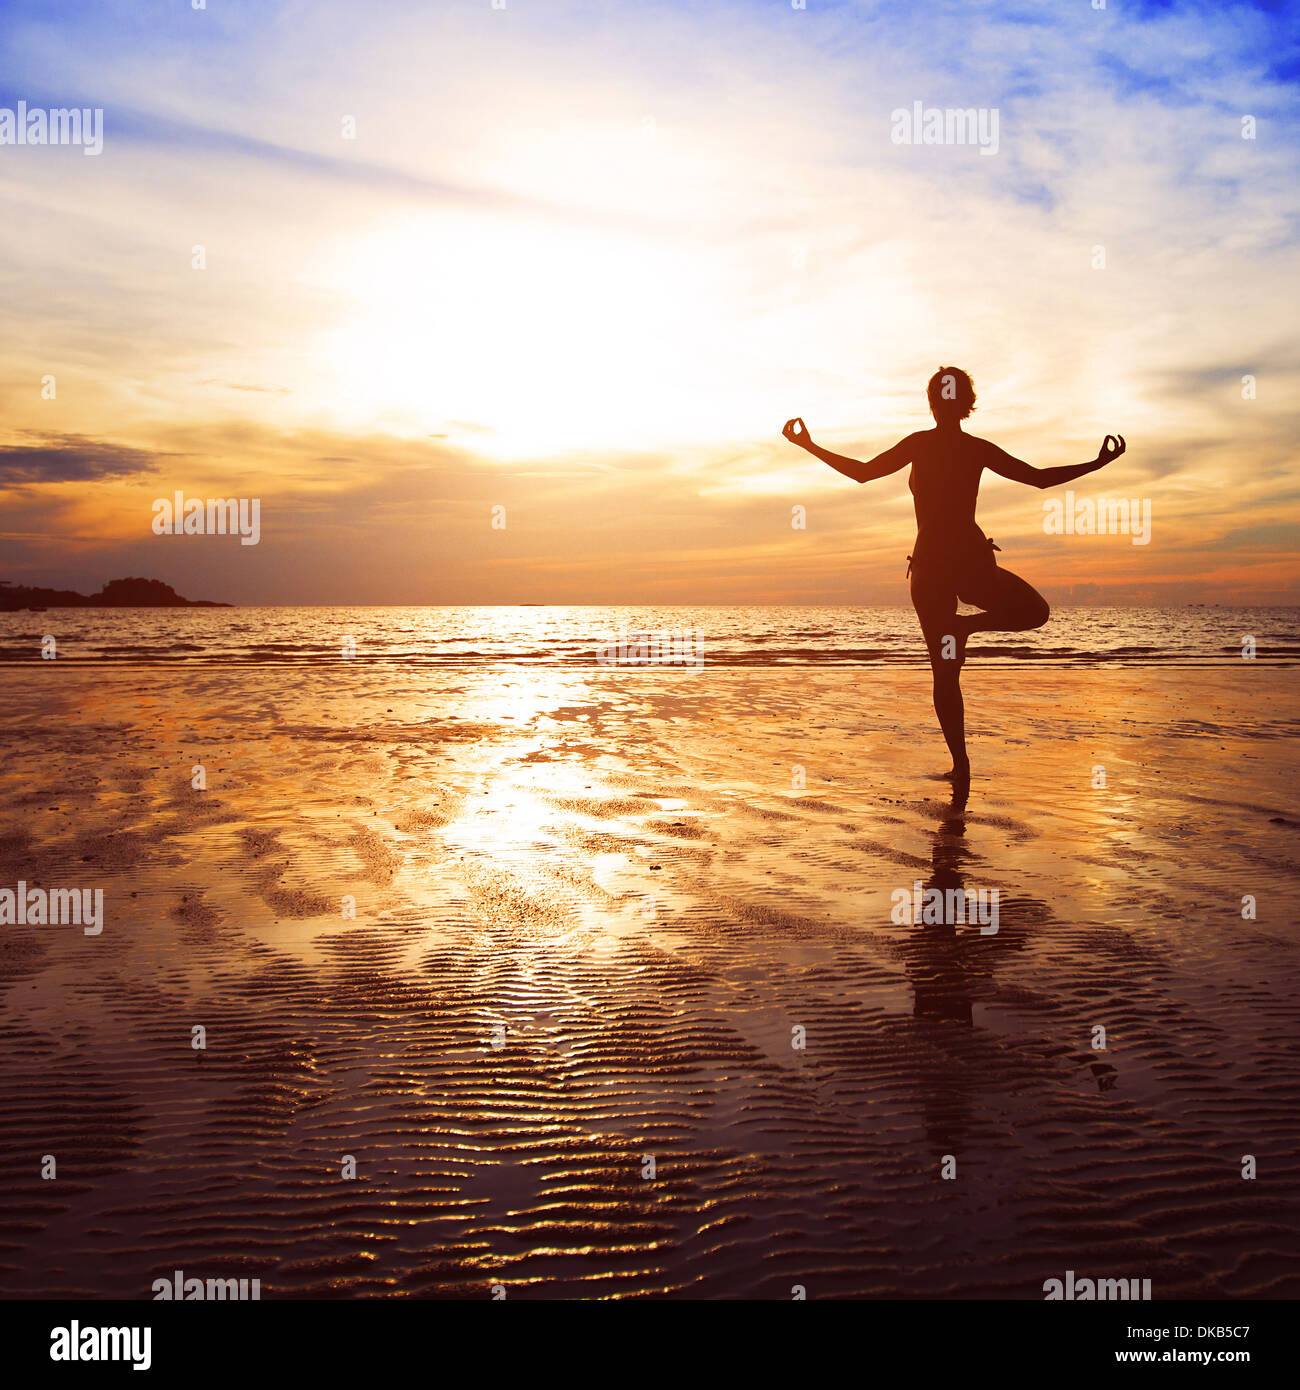 yoga beach background - Stock Image